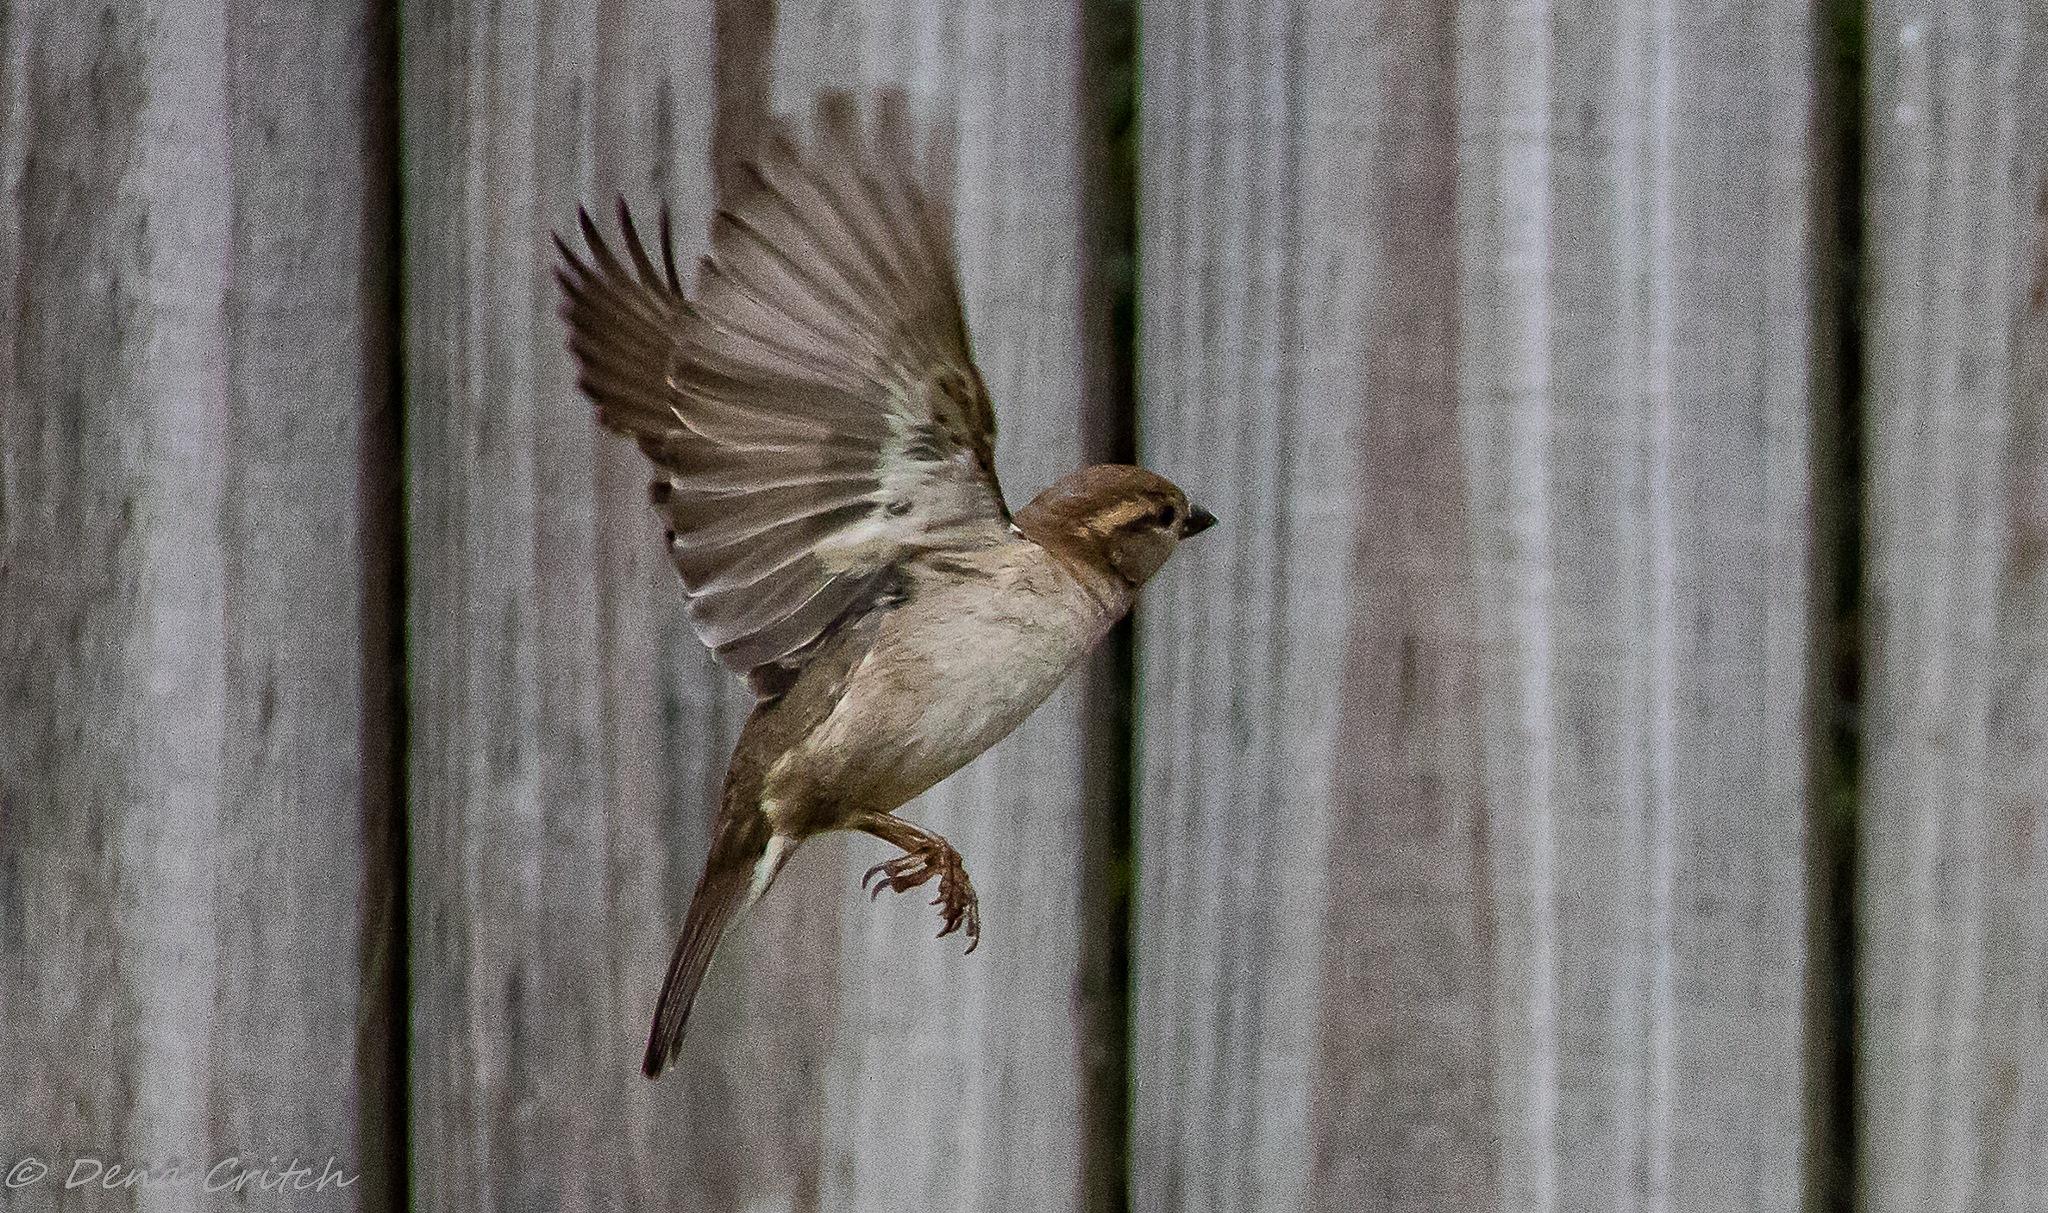 Flight of a Sparrow by dena.critch